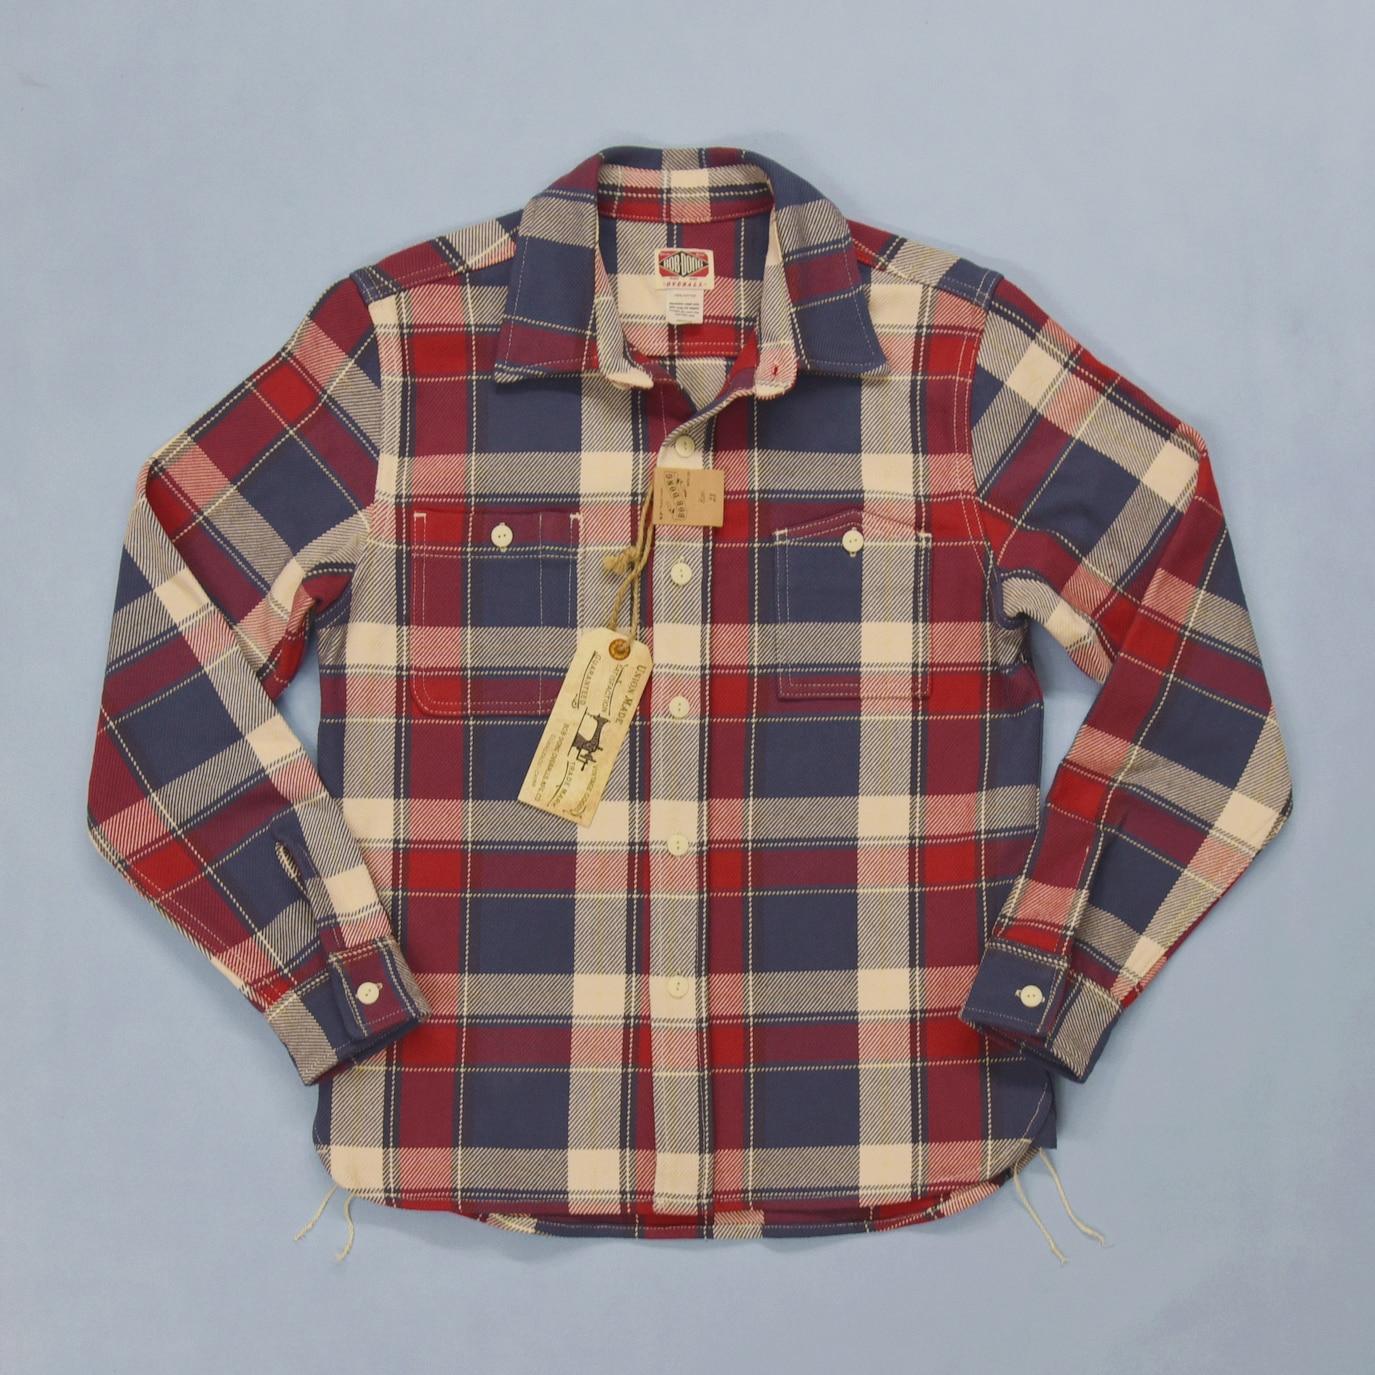 BOB DONG Ultra Heavy Plaid Shirts Men's Workwear Long Sleeved Checked Shirts